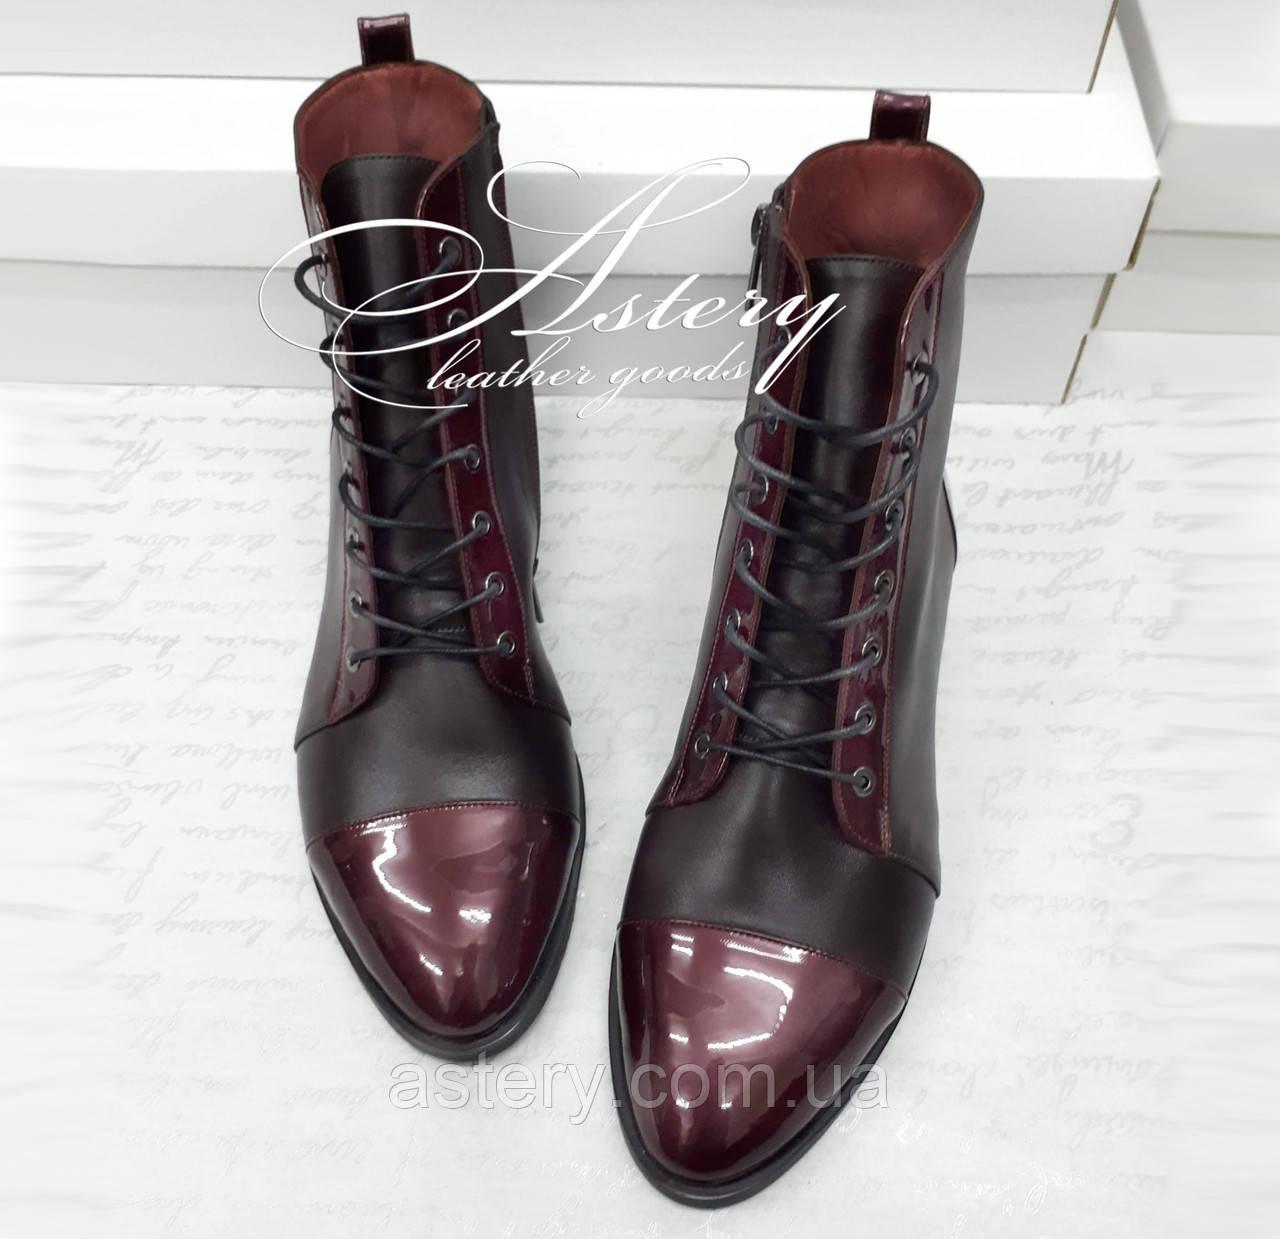 Женские ботинки из кожи на шнуровке цвета марсала